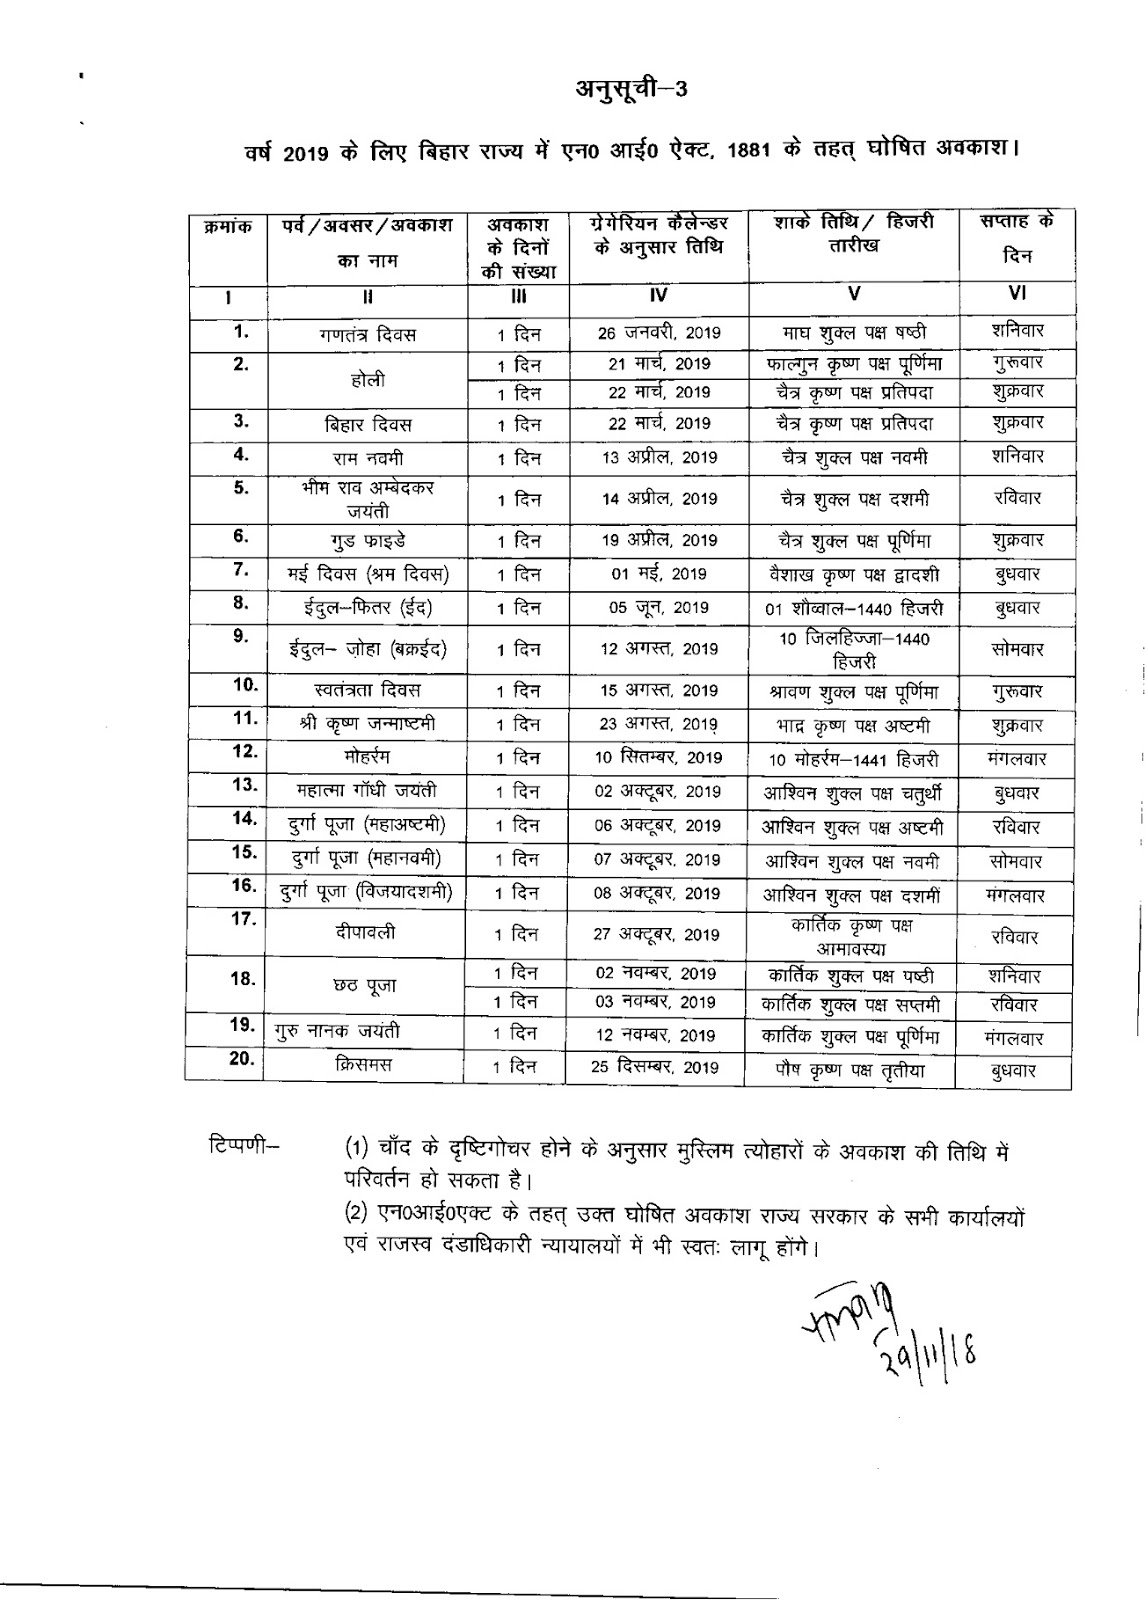 Bihar Government Calendar 2019 regarding Bihar Govt Calender